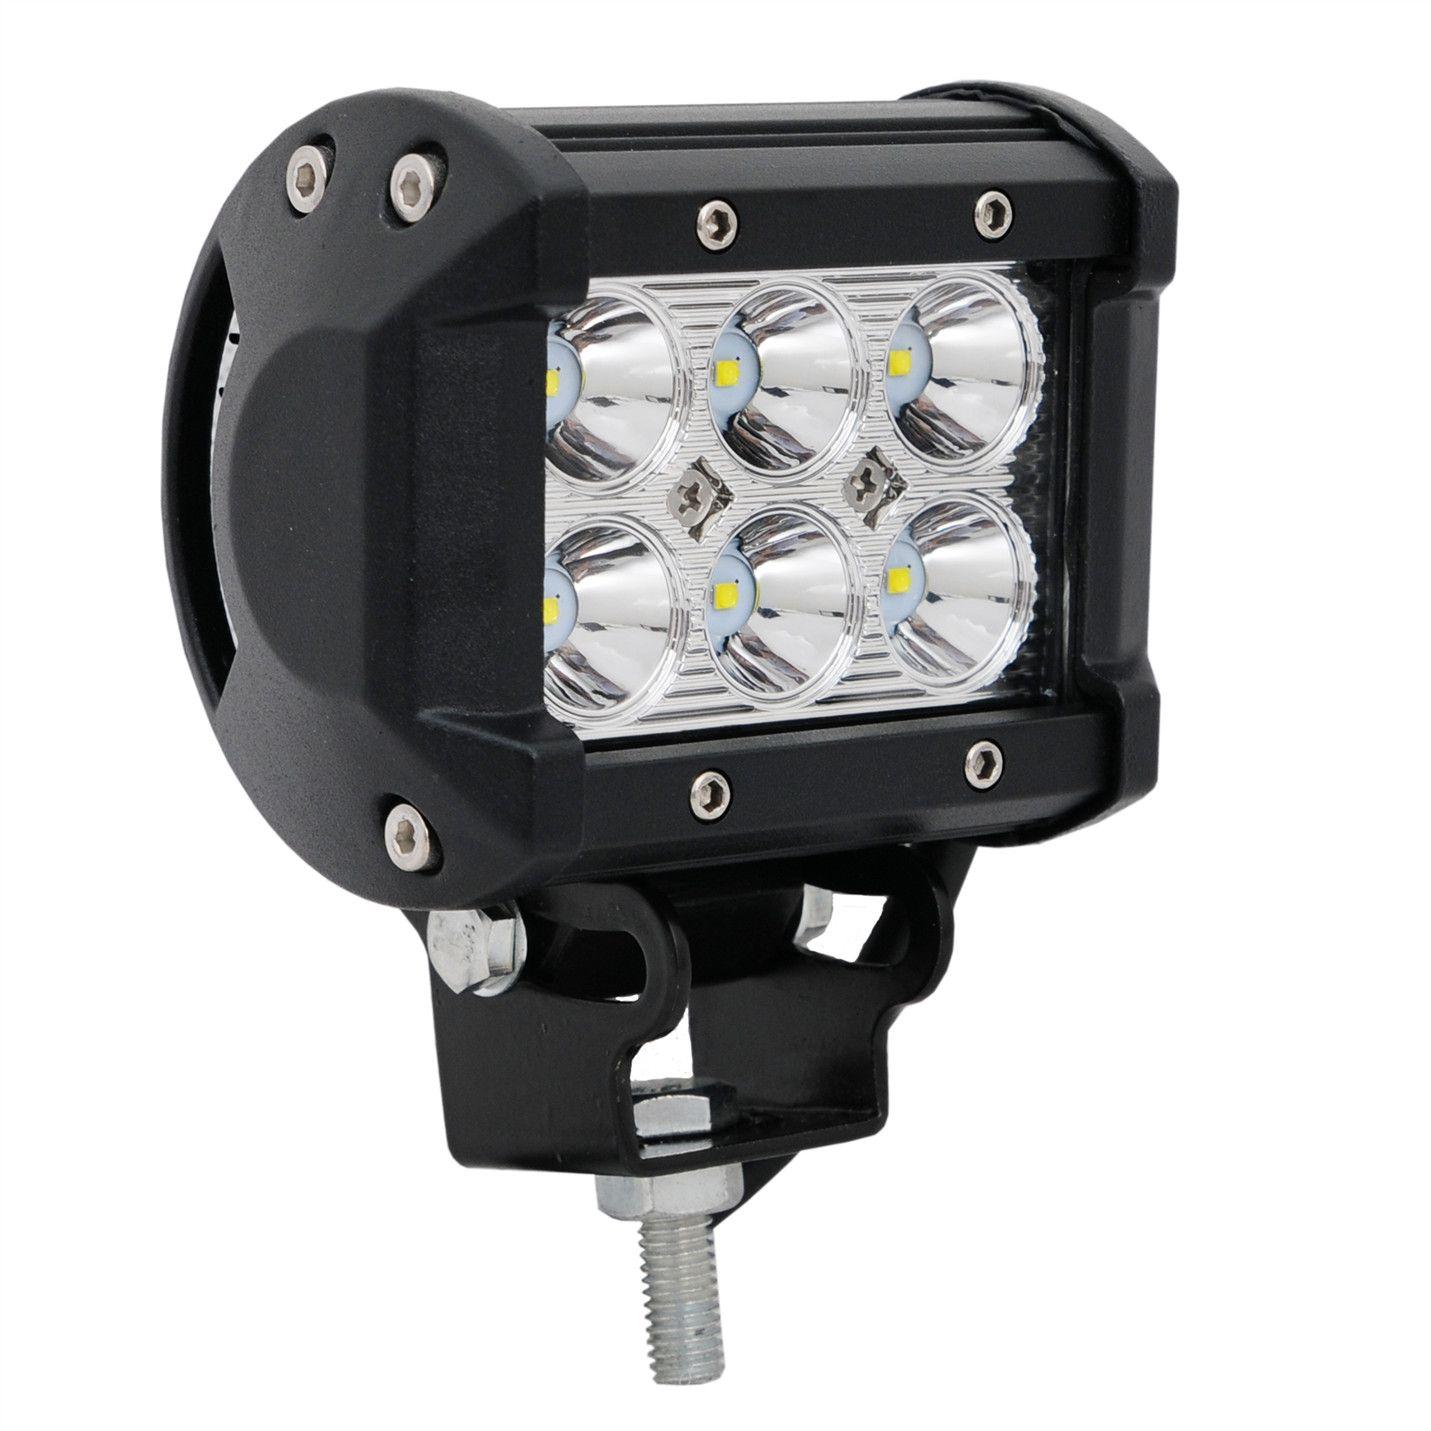 1 Piece high intensity 12v 24v DC automobile 4inch 18w waterproof IP67 offroad led light bar